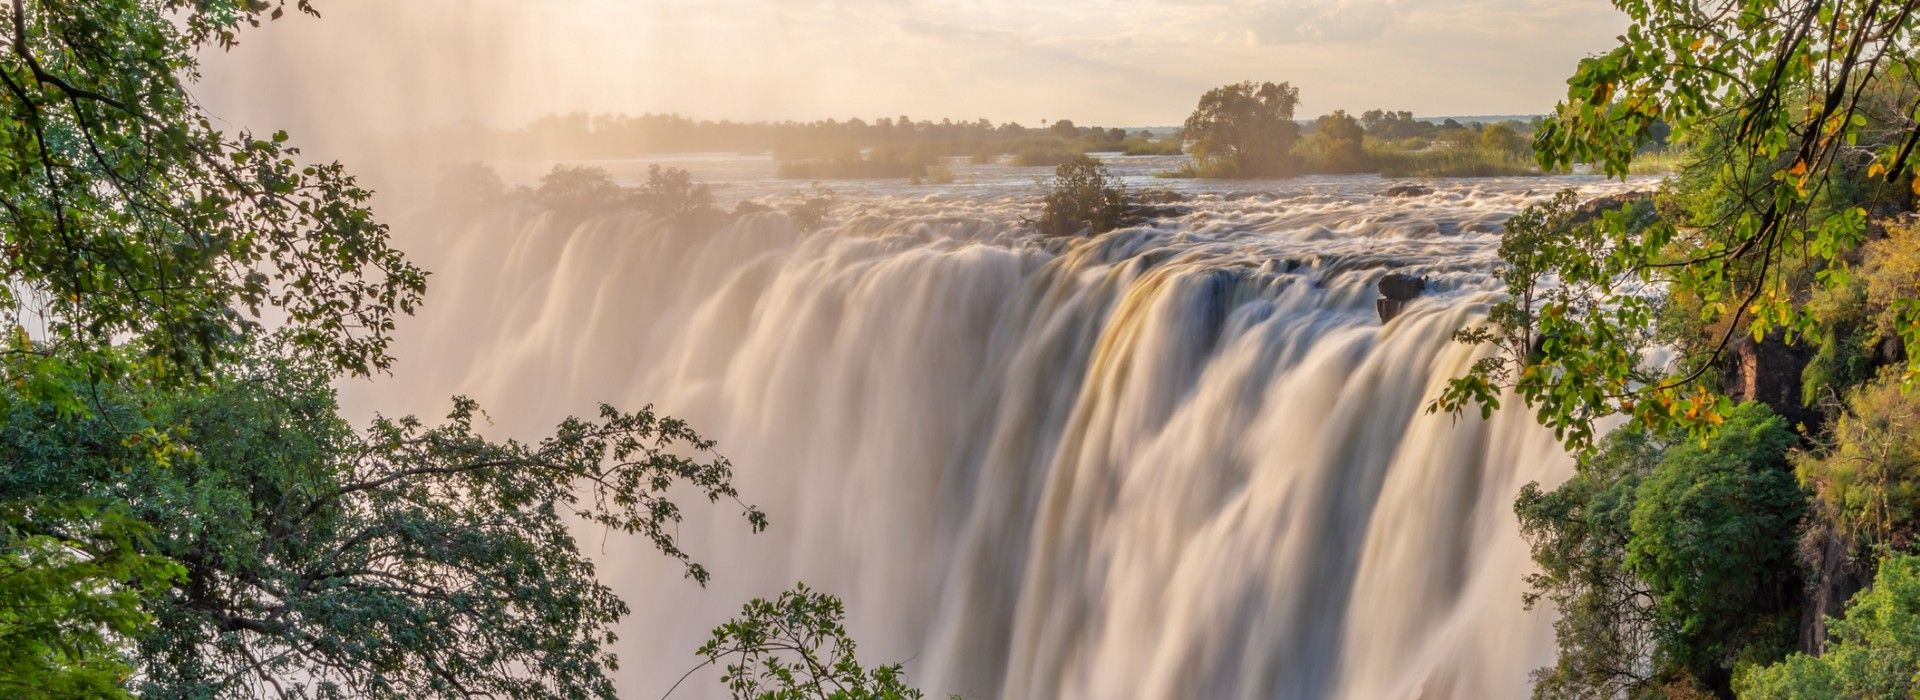 Safari Tours in East Africa